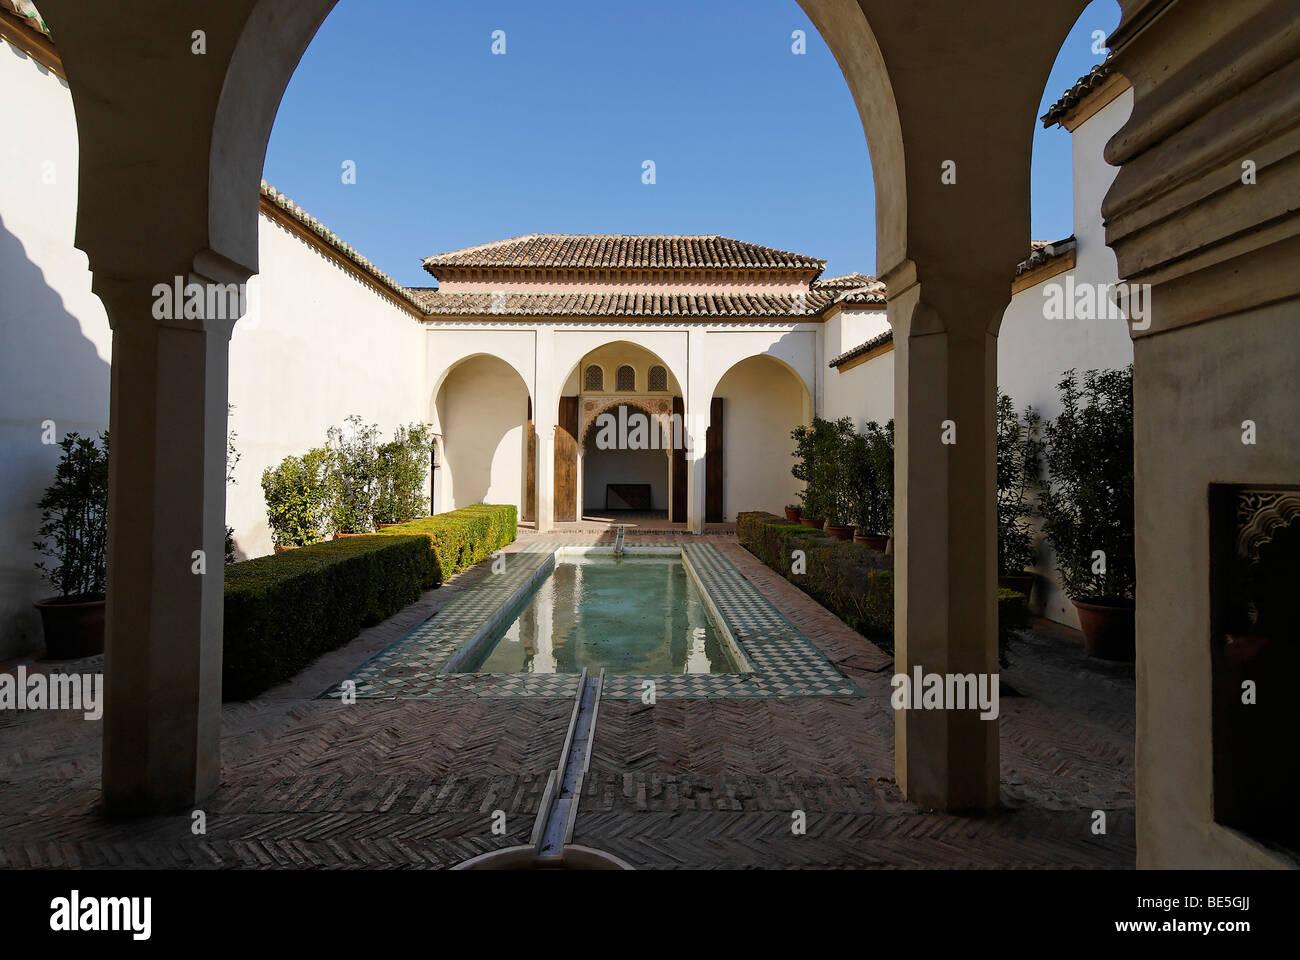 Le Patio de la Alberca, château Alcazaba, Malaga, Andalousie, Espagne, Europe Photo Stock